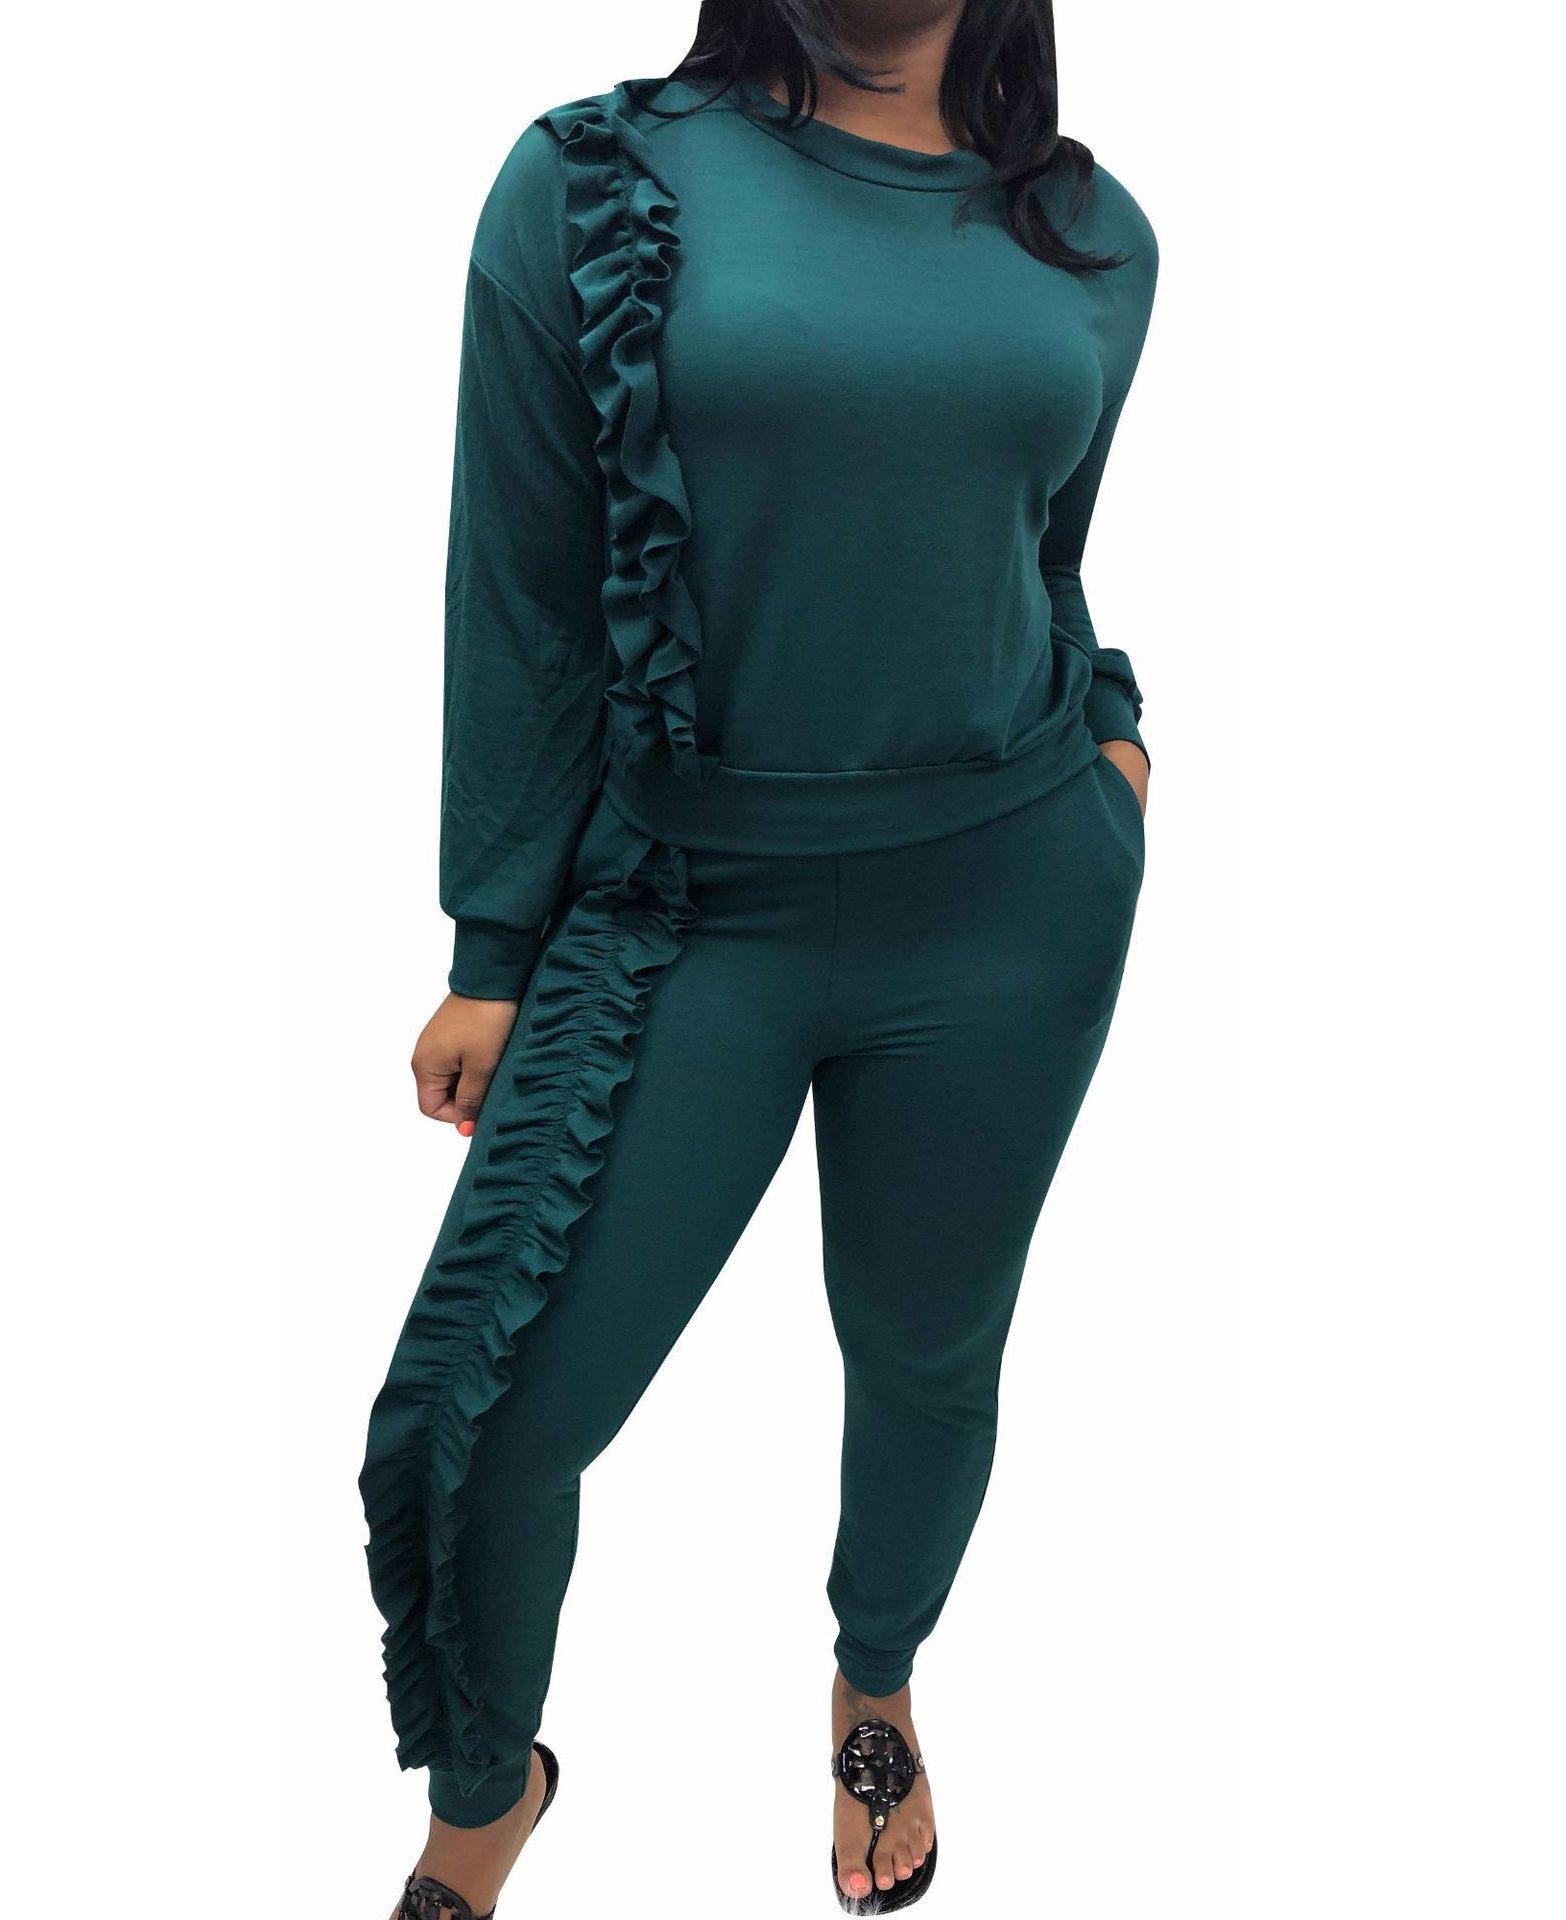 Mojessy Women's Ruffled Outfits Long Sleeve Shirt + Pencil Pants Set Sweatsuits Tracksuits Clubwear XX-Large Dark Green